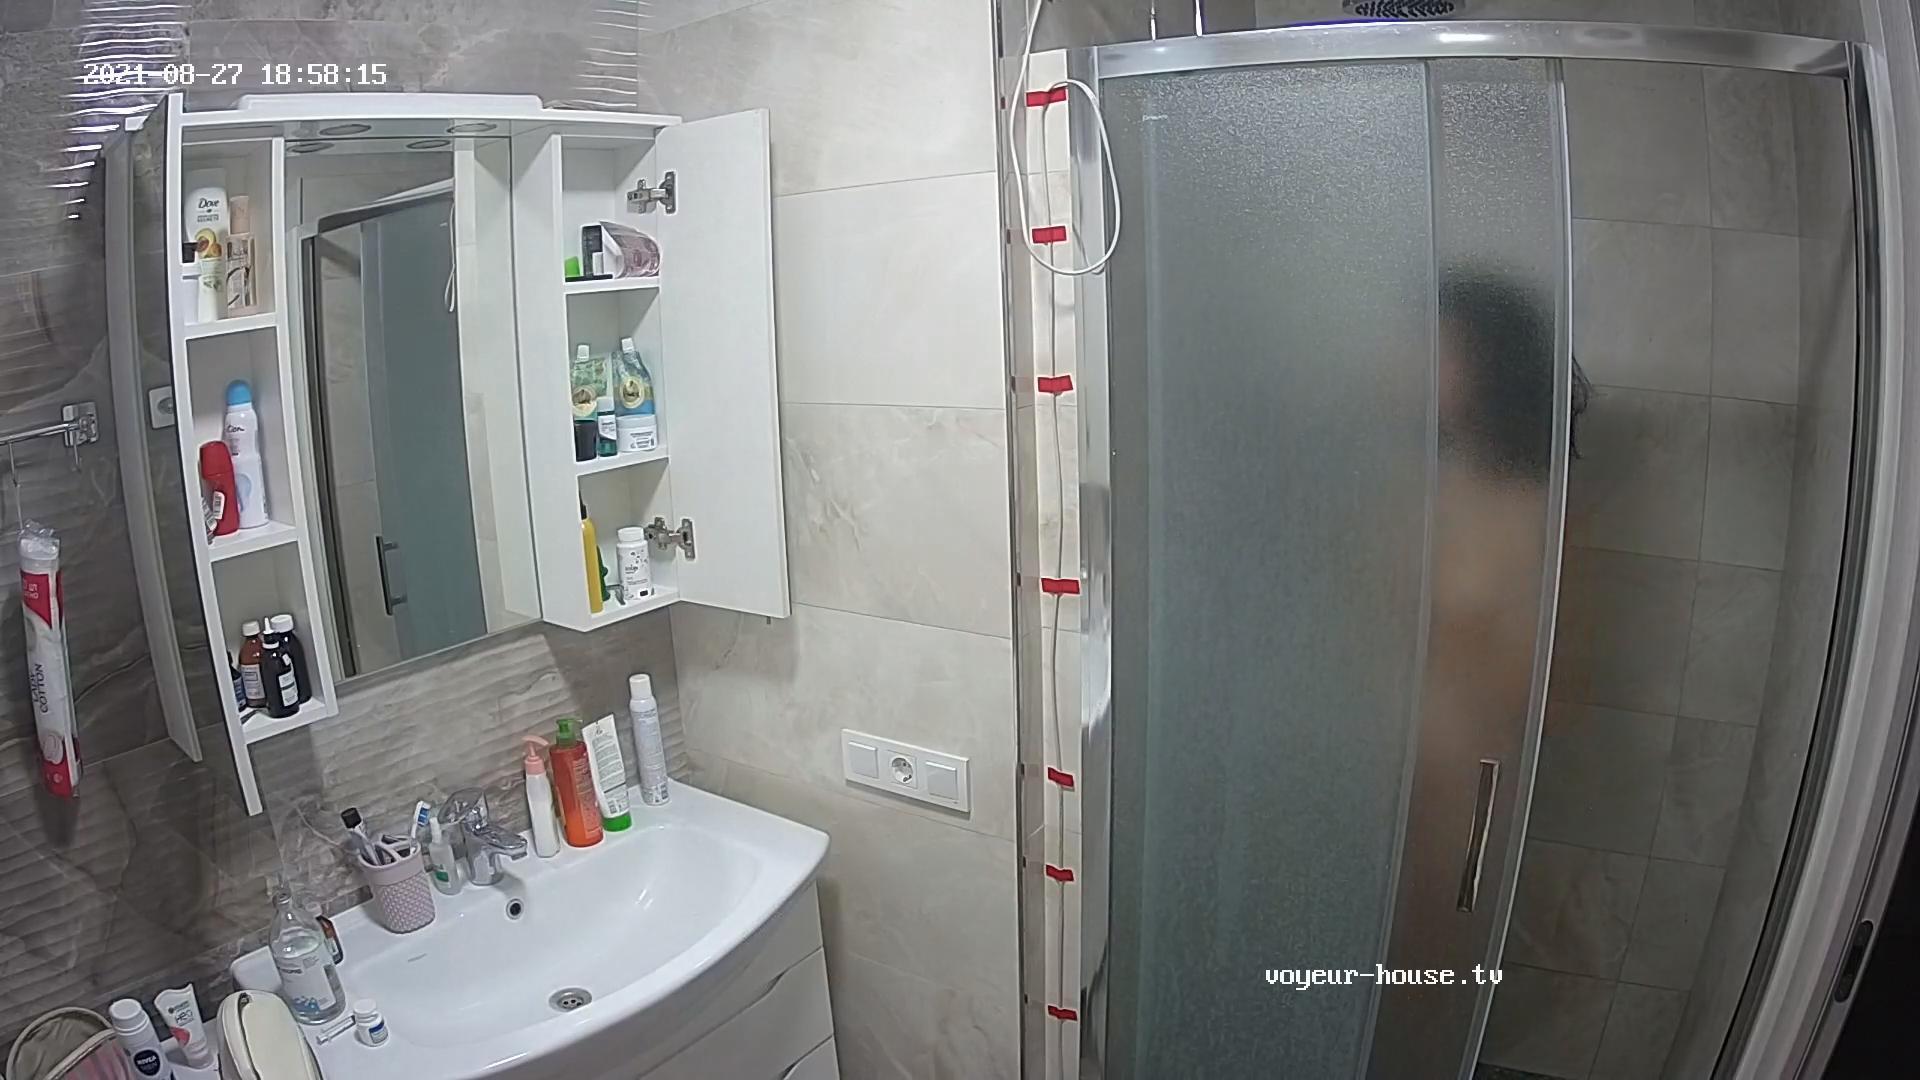 Elliot Ali quick wash after sex Aug 27 2021 cam 2